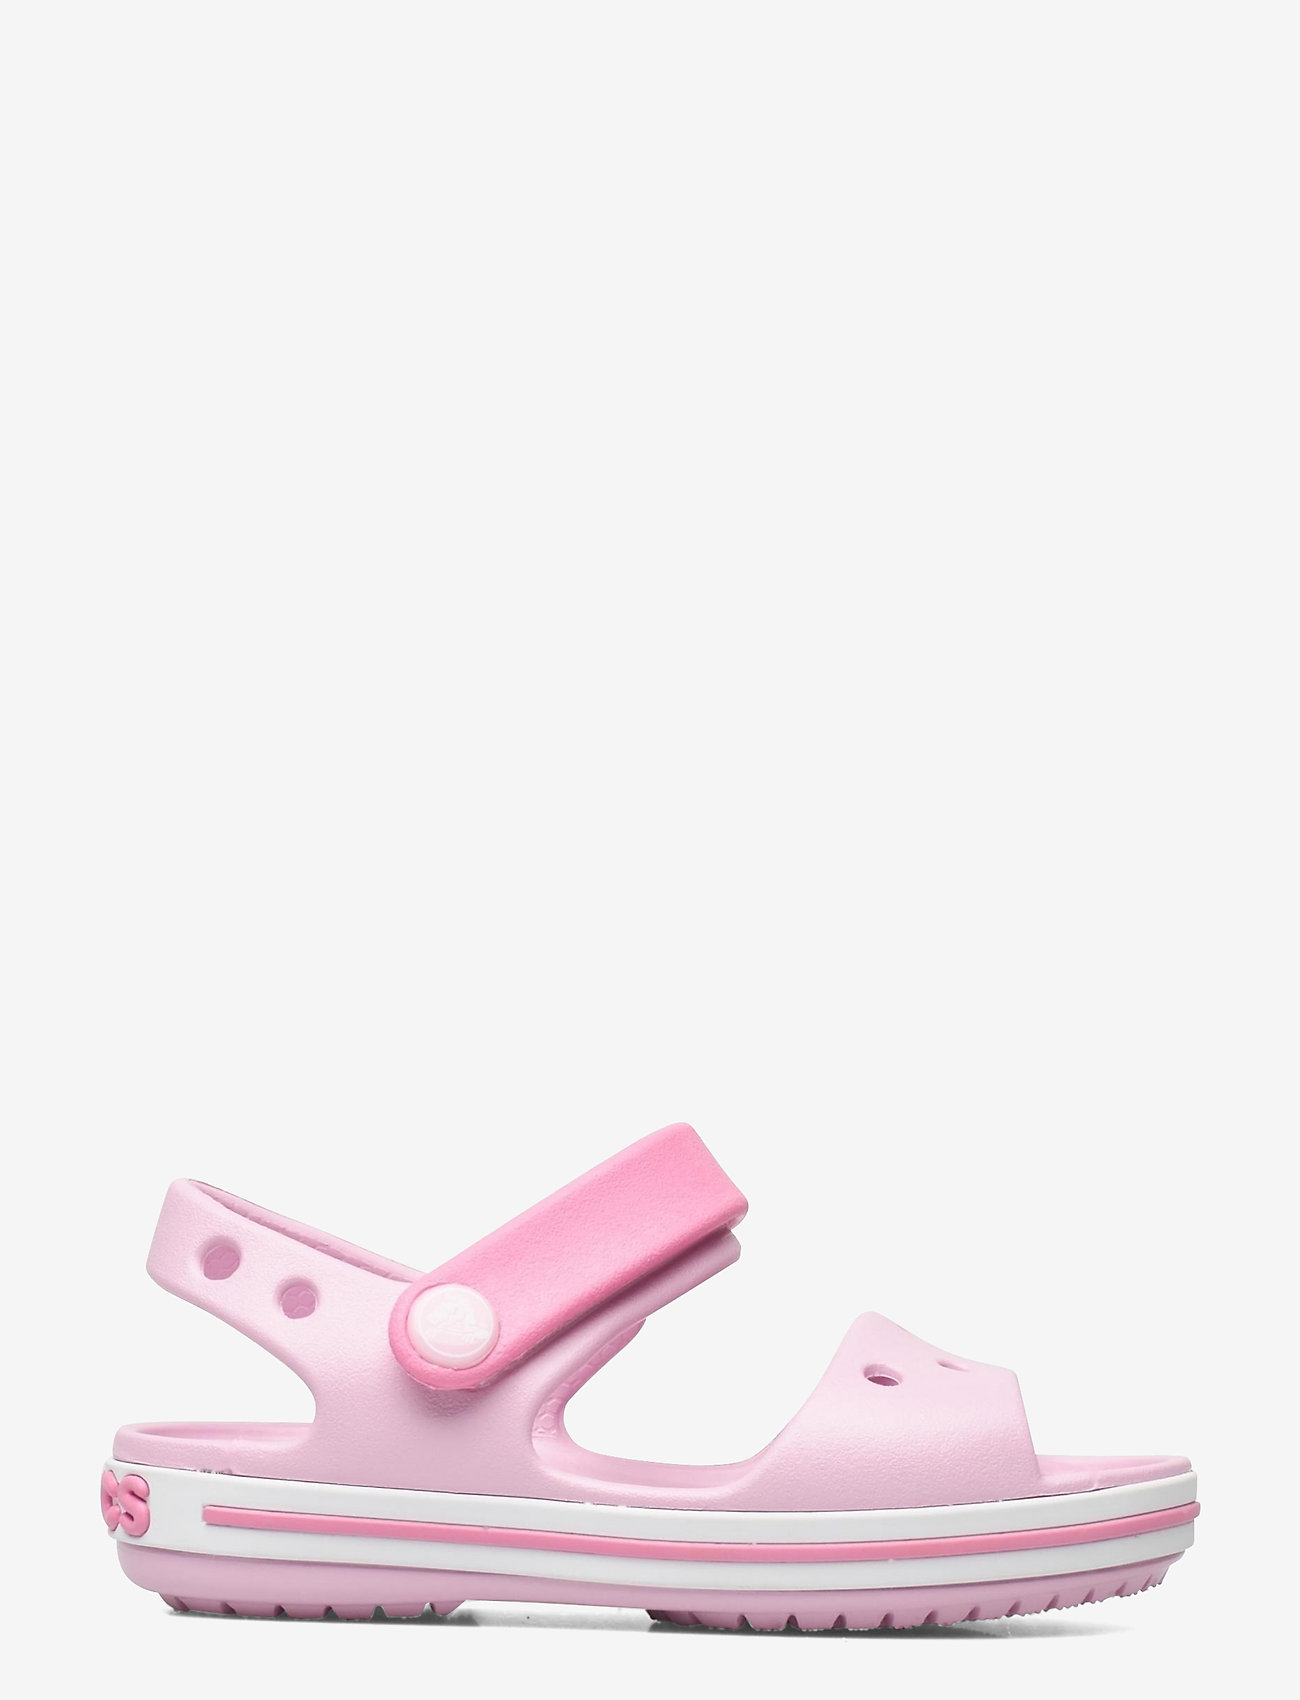 Crocs - Crocband Sandal Kids - ballerina pink - 1